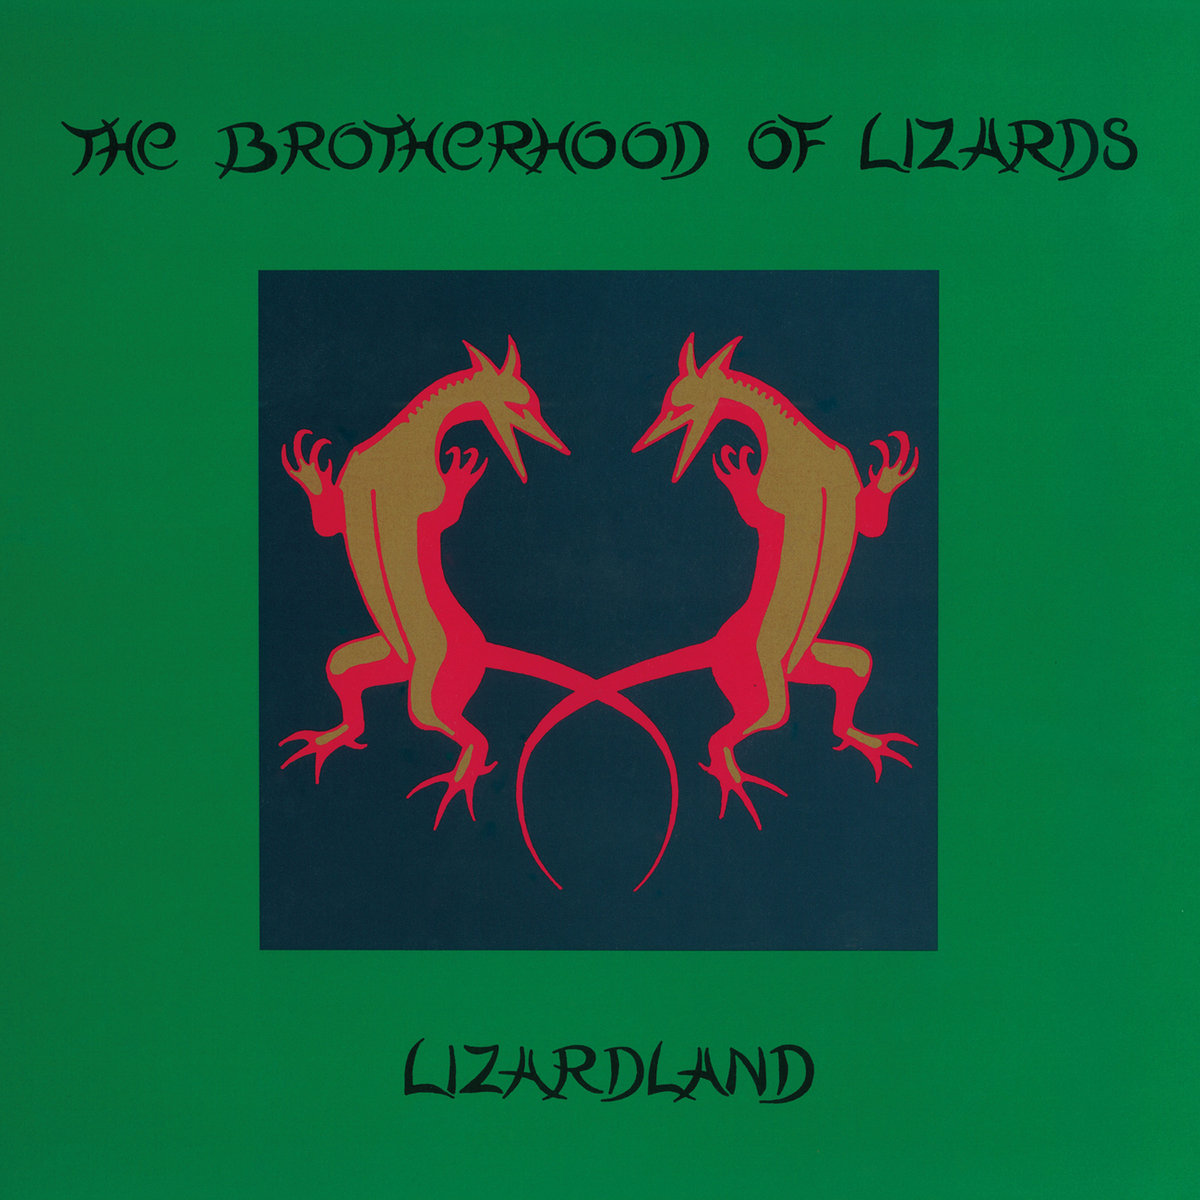 The Brotherhood of Lizards